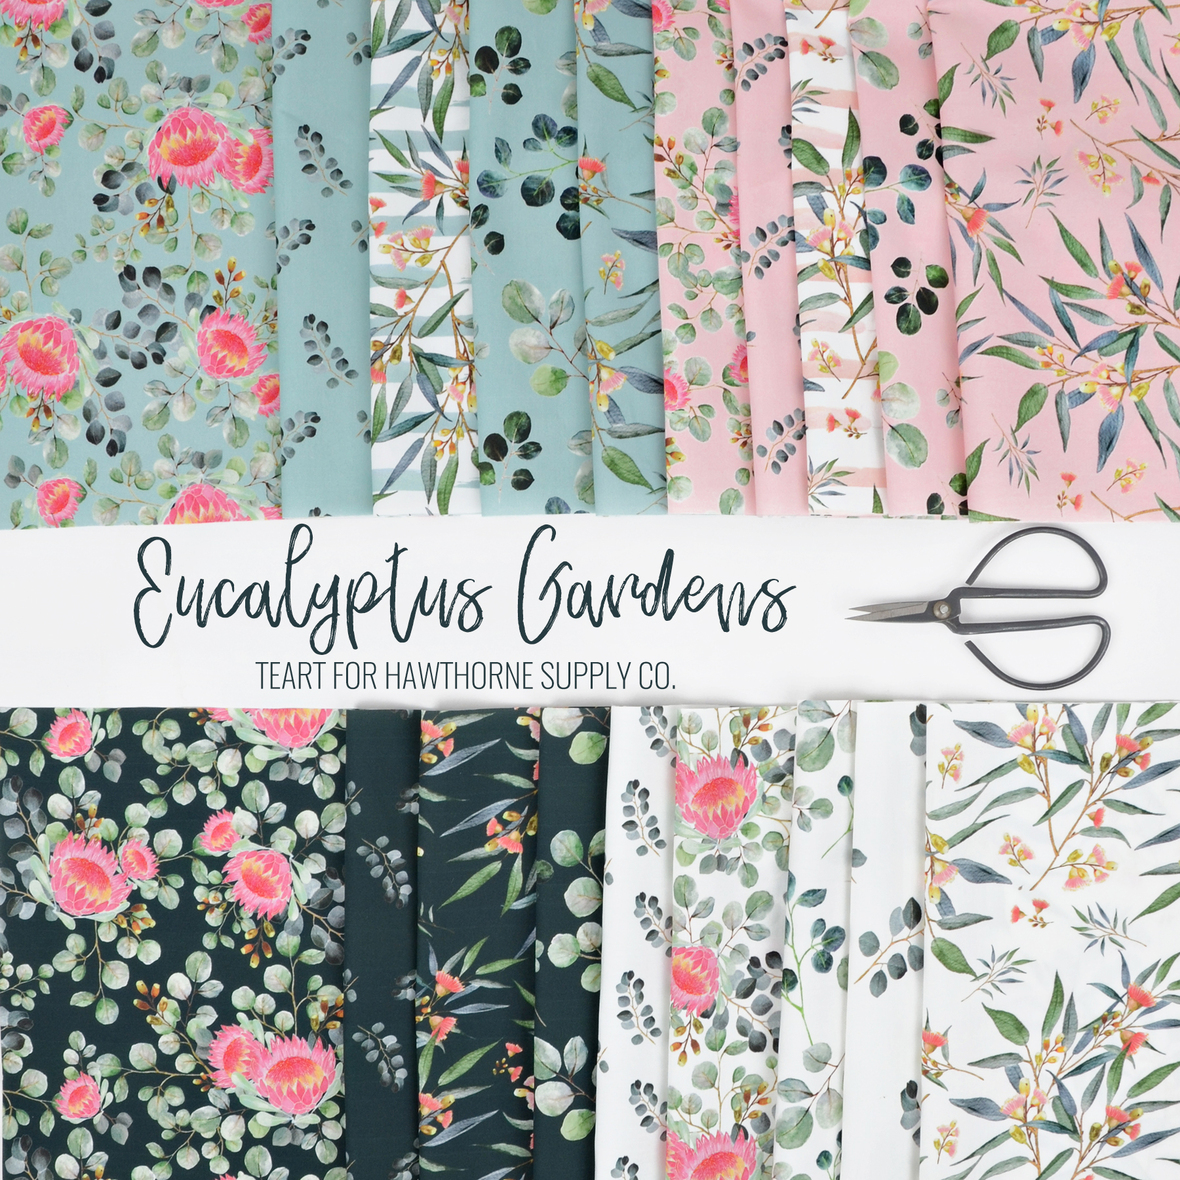 B Eucalyptus Gardens fabric by Teart for Hawthorne Supply Co.